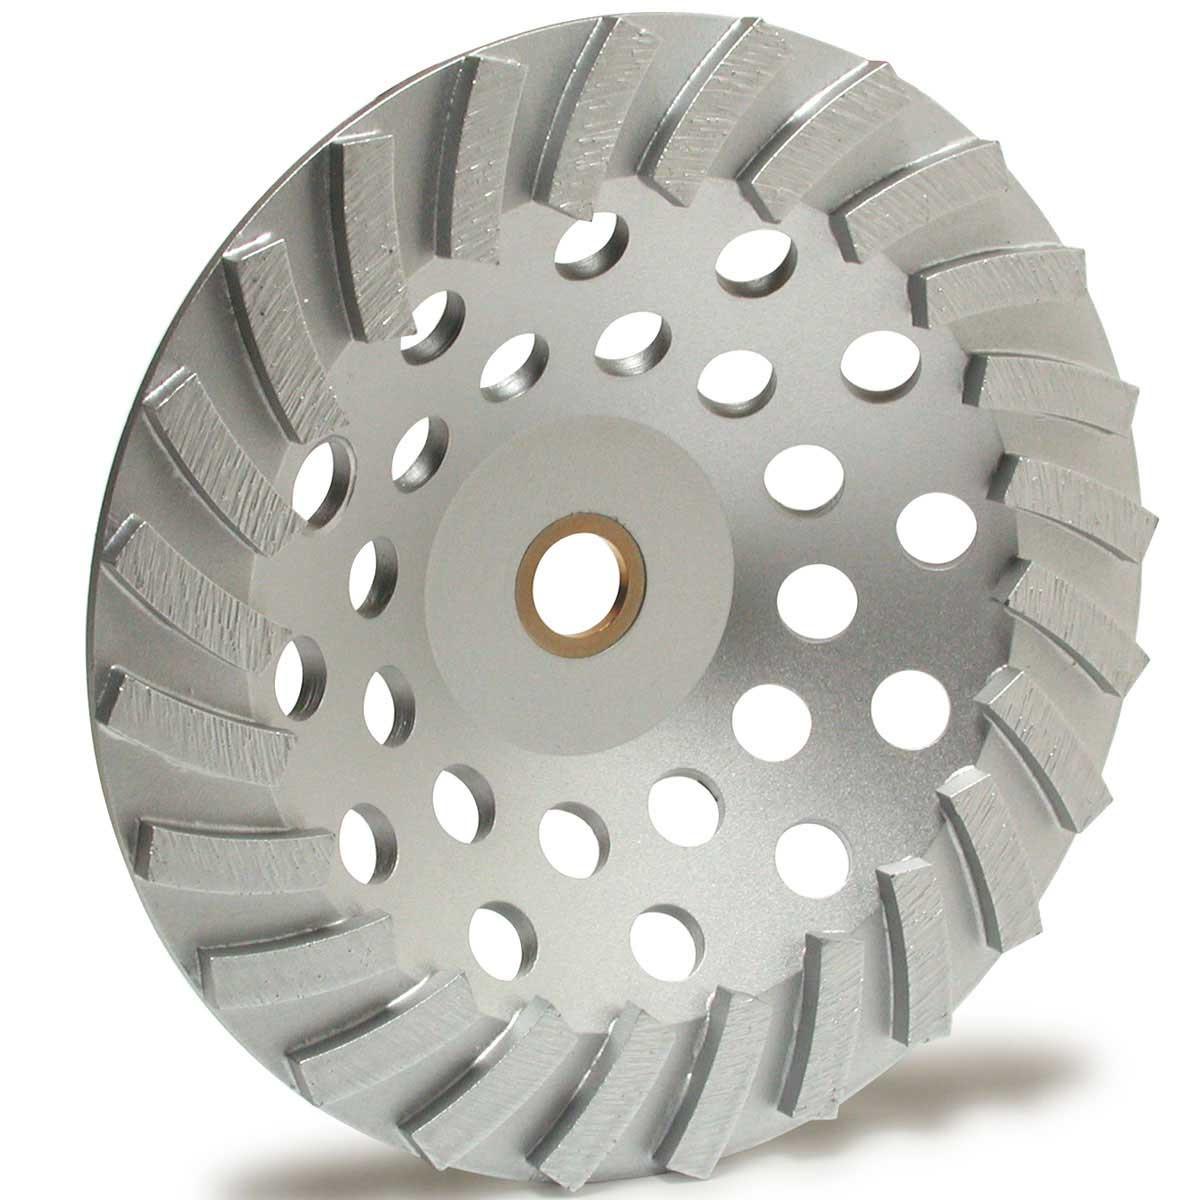 MK-504SG2 Diamond Cup Wheel